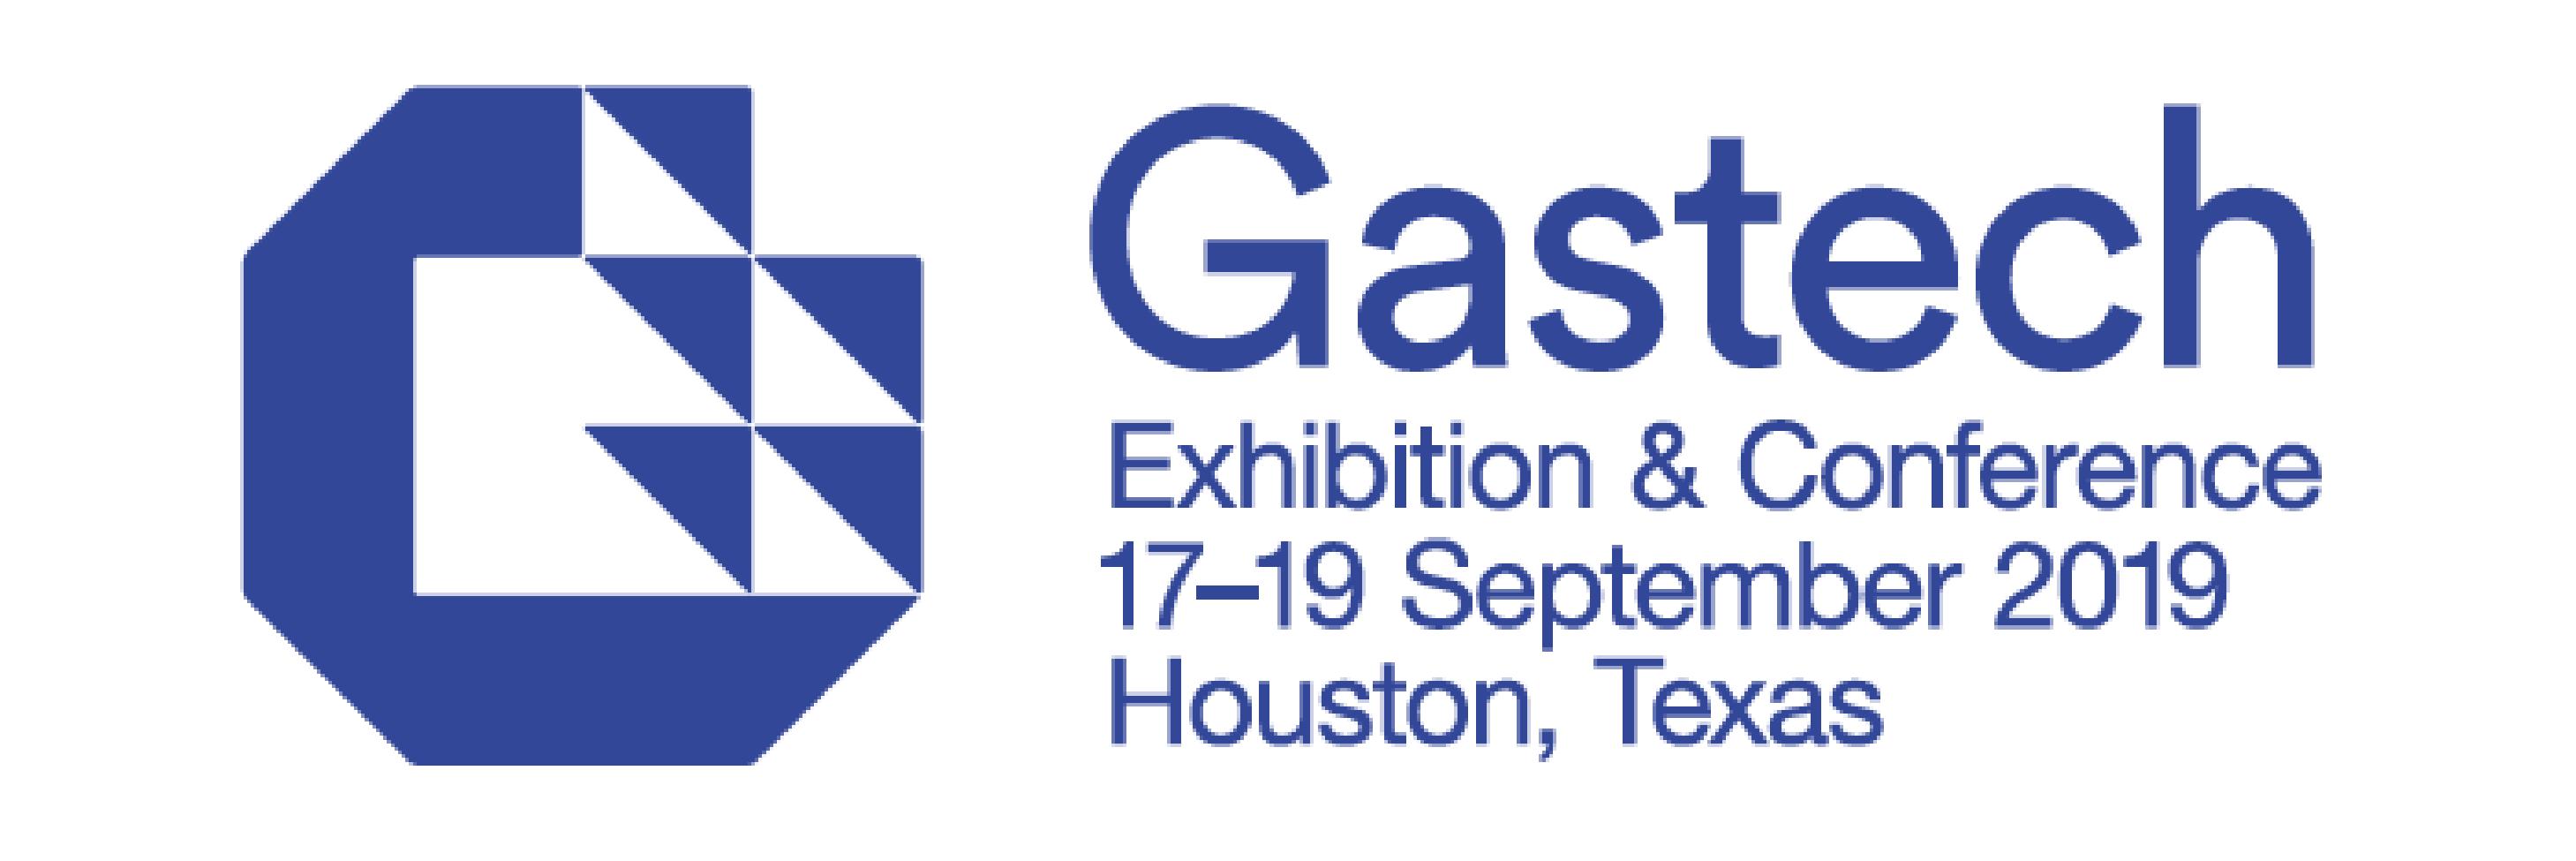 2019 July Newsletter - gastech 2019 logo-12